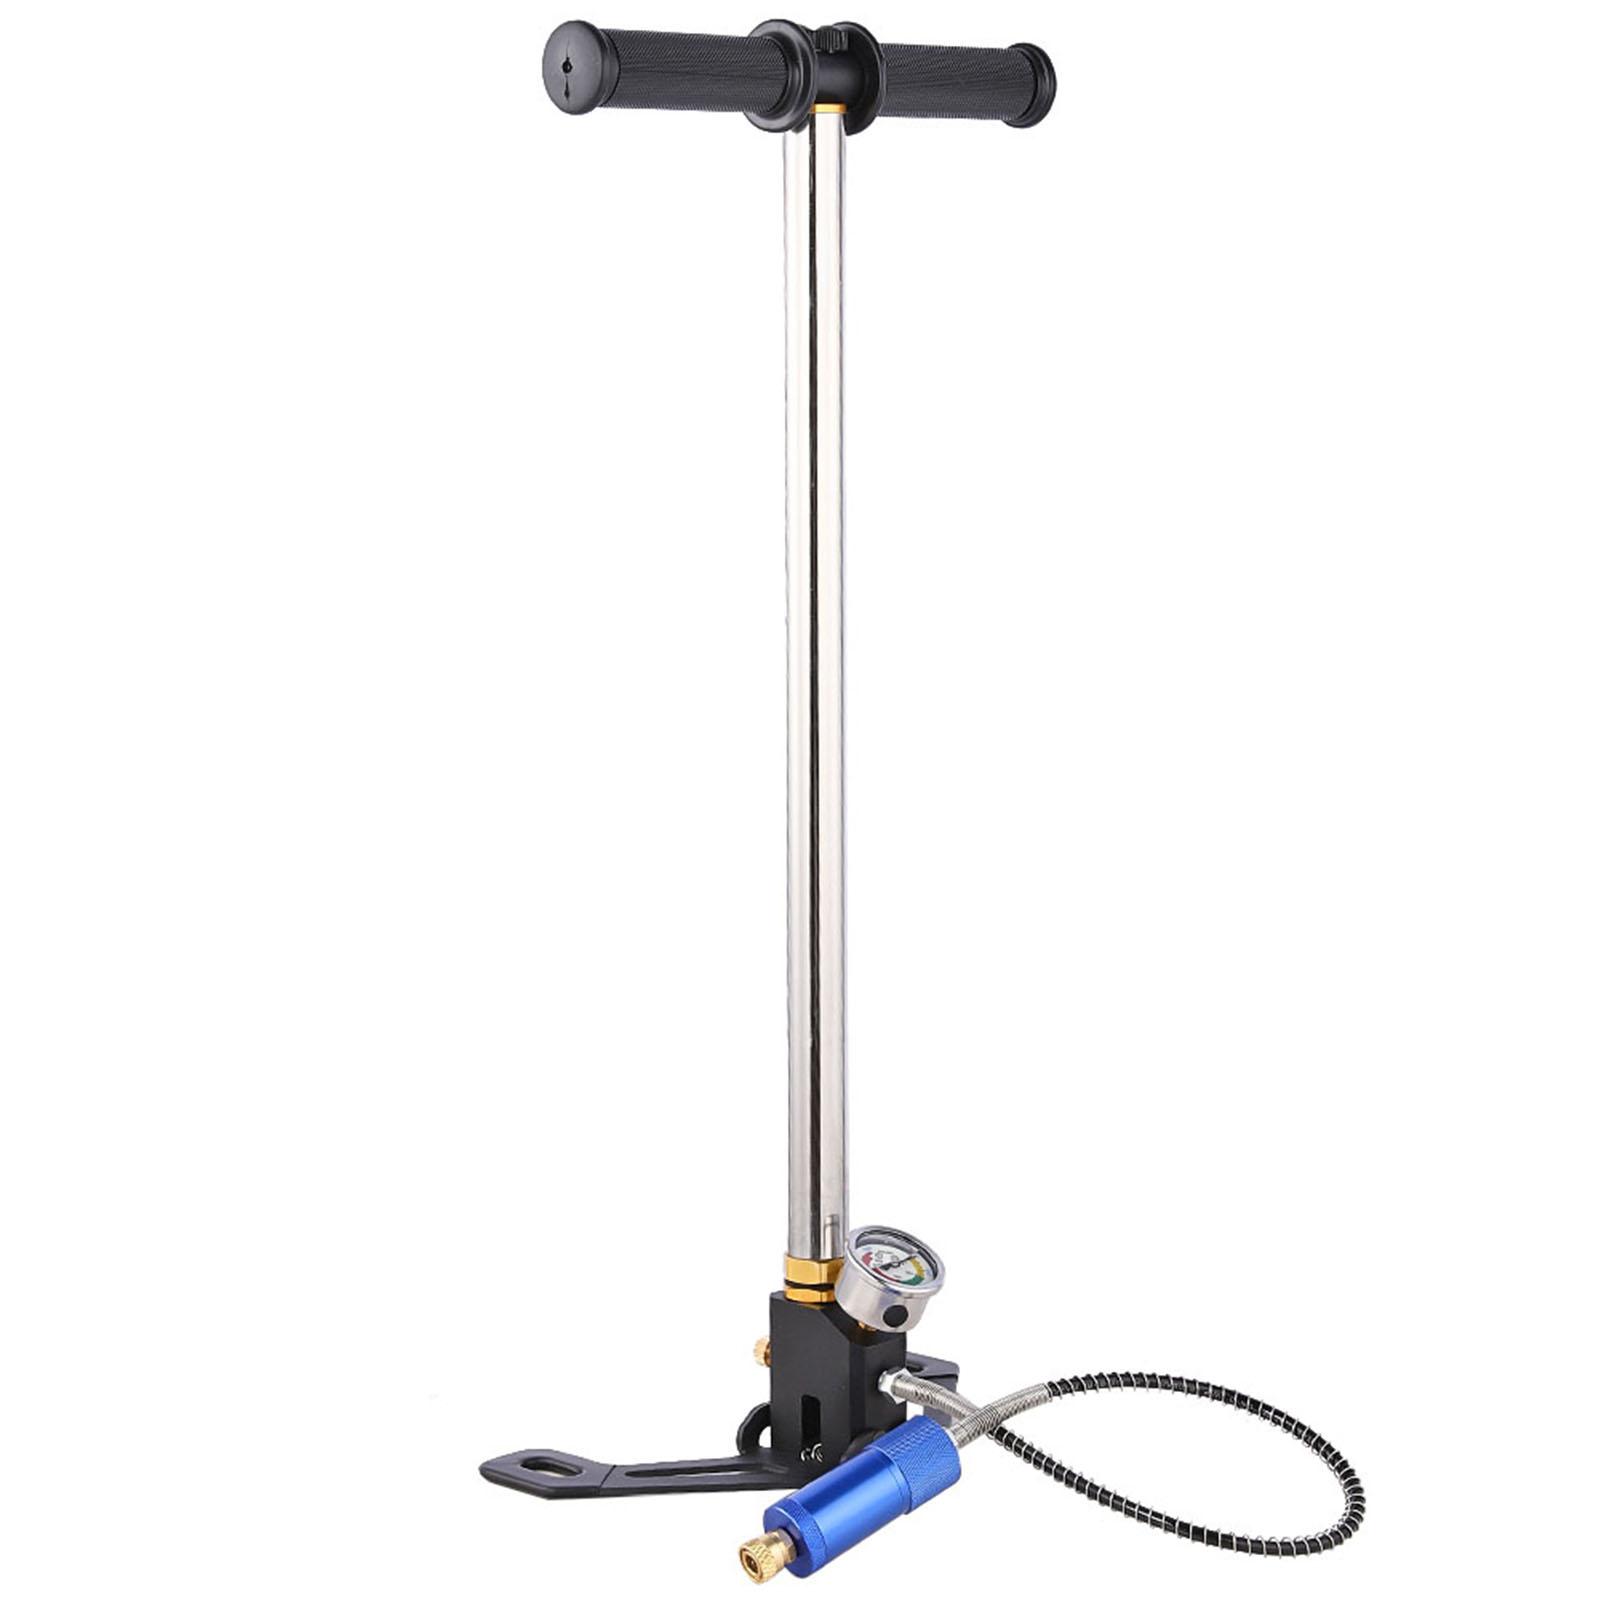 Respirator-Oxygen-Cylinder-Tank-Manual-High-Pressure-Air-Pump-Diving-Equipment thumbnail 18